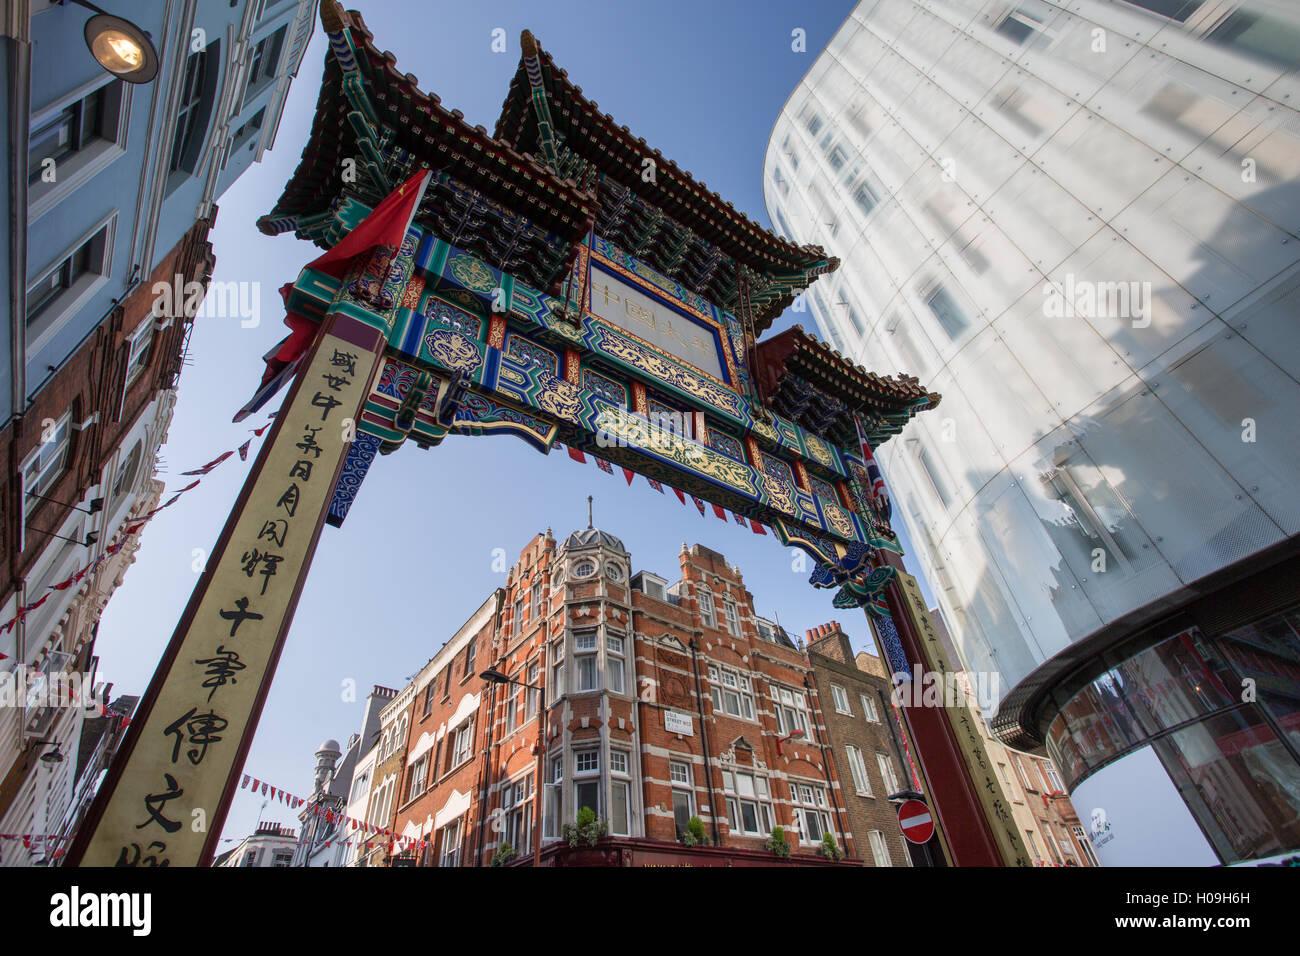 Chinatown on Wardour Street, London, England, United Kingdom, Europe - Stock Image